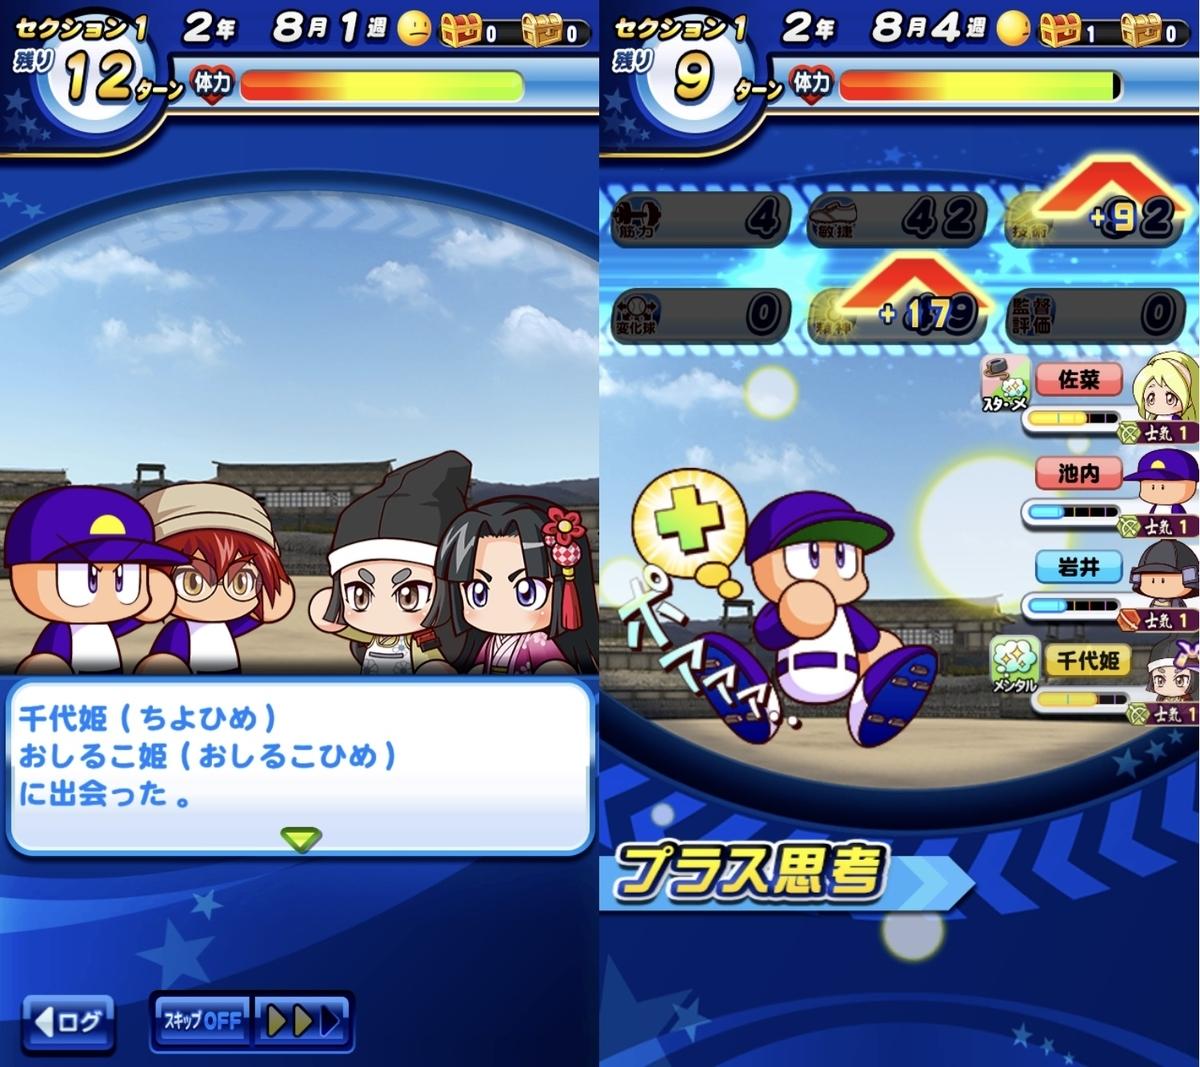 f:id:mooyoshi:20210422164543j:plain